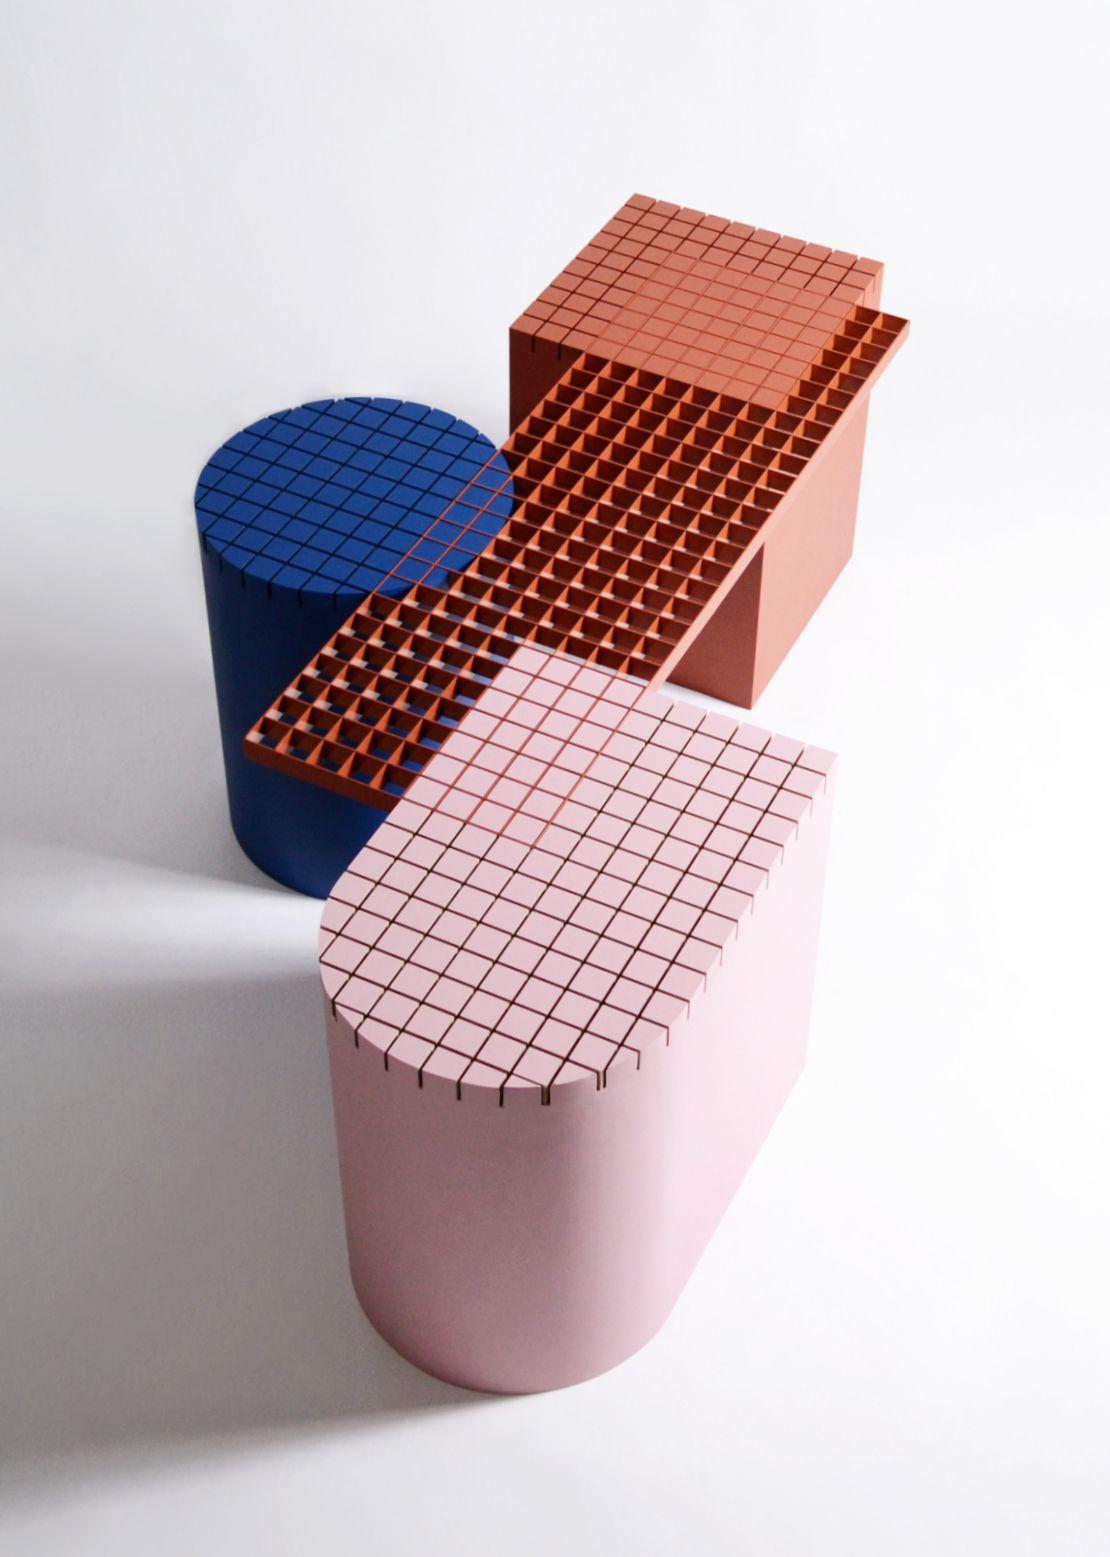 nortstudio⎪bench urban shapes #furnitureaccessories